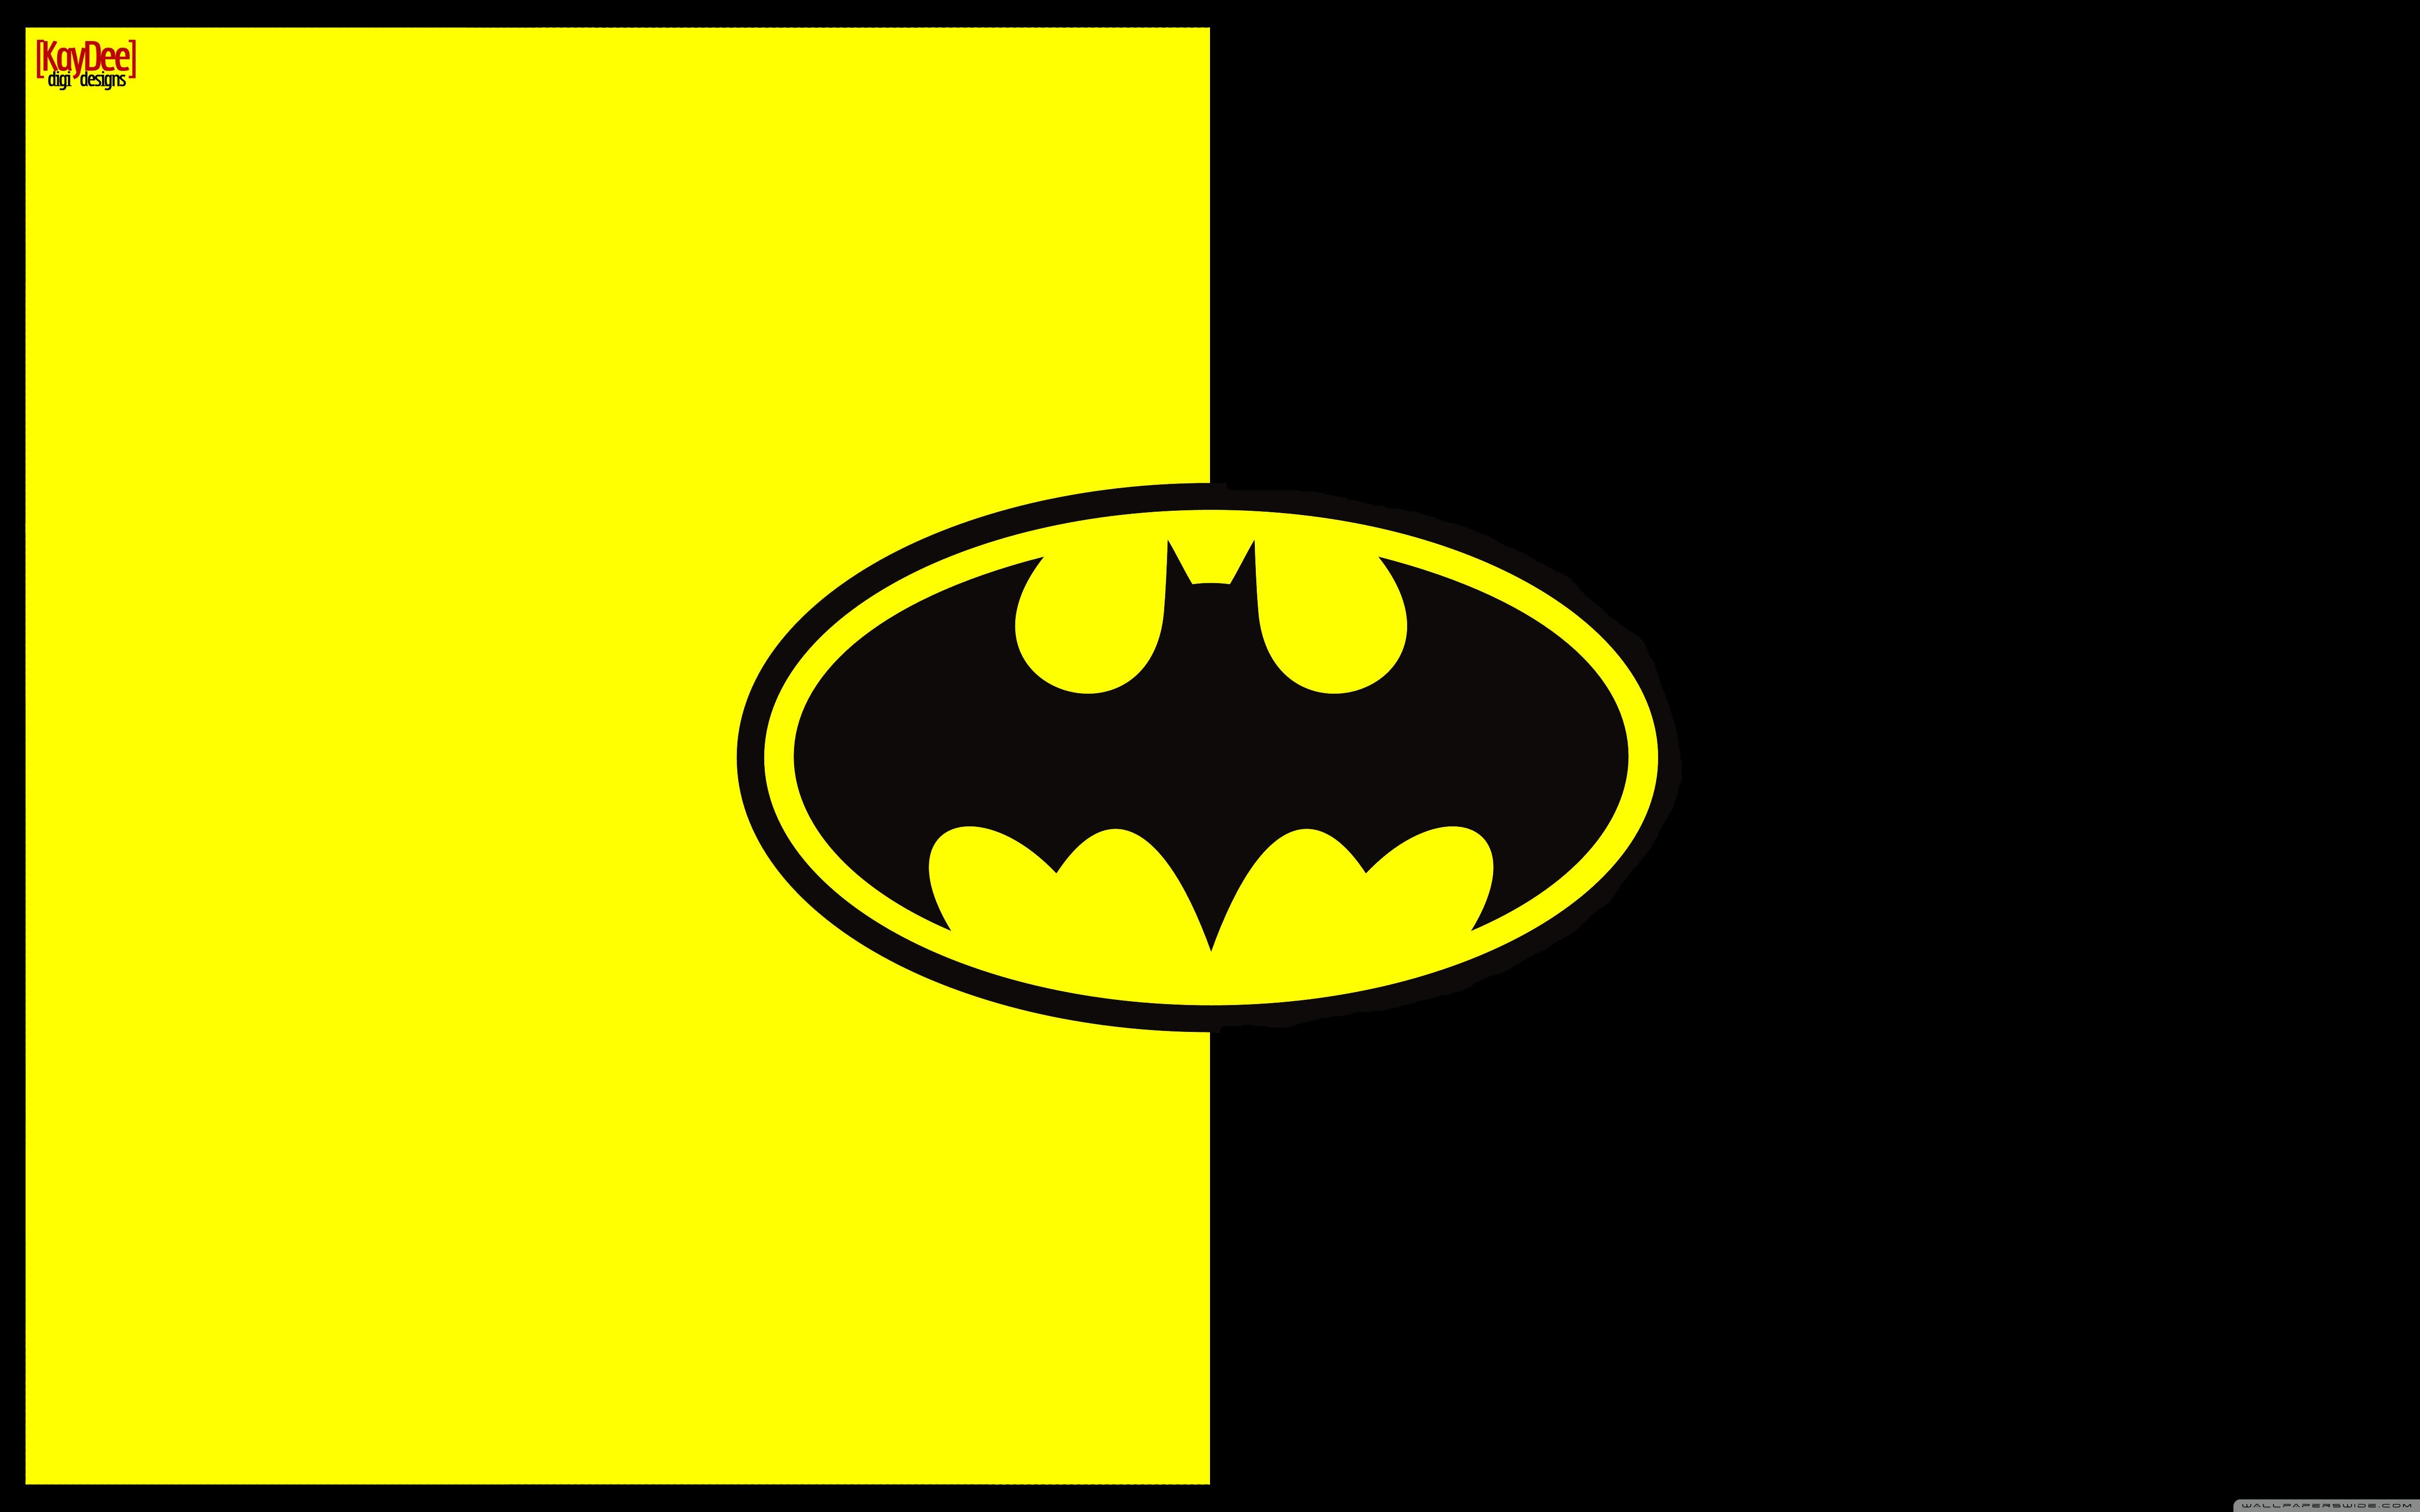 batman logo wallpaper Logospikecom Famous and 5120x3200